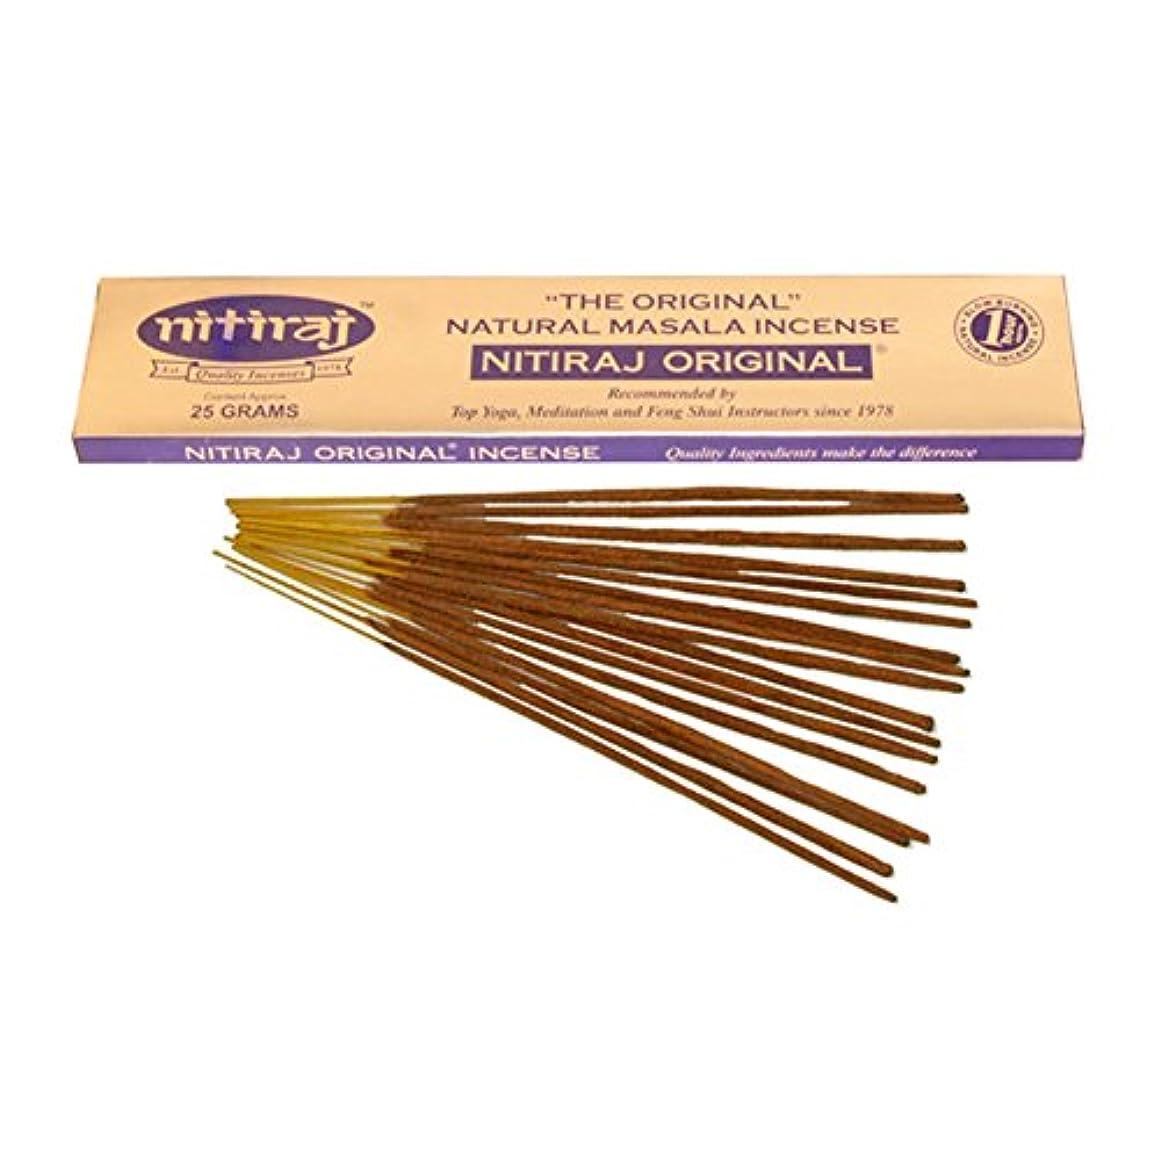 (25 Grammes) - Nitiraj The Original Natural Masala Incense Slow Burning 1 Hour per Stick